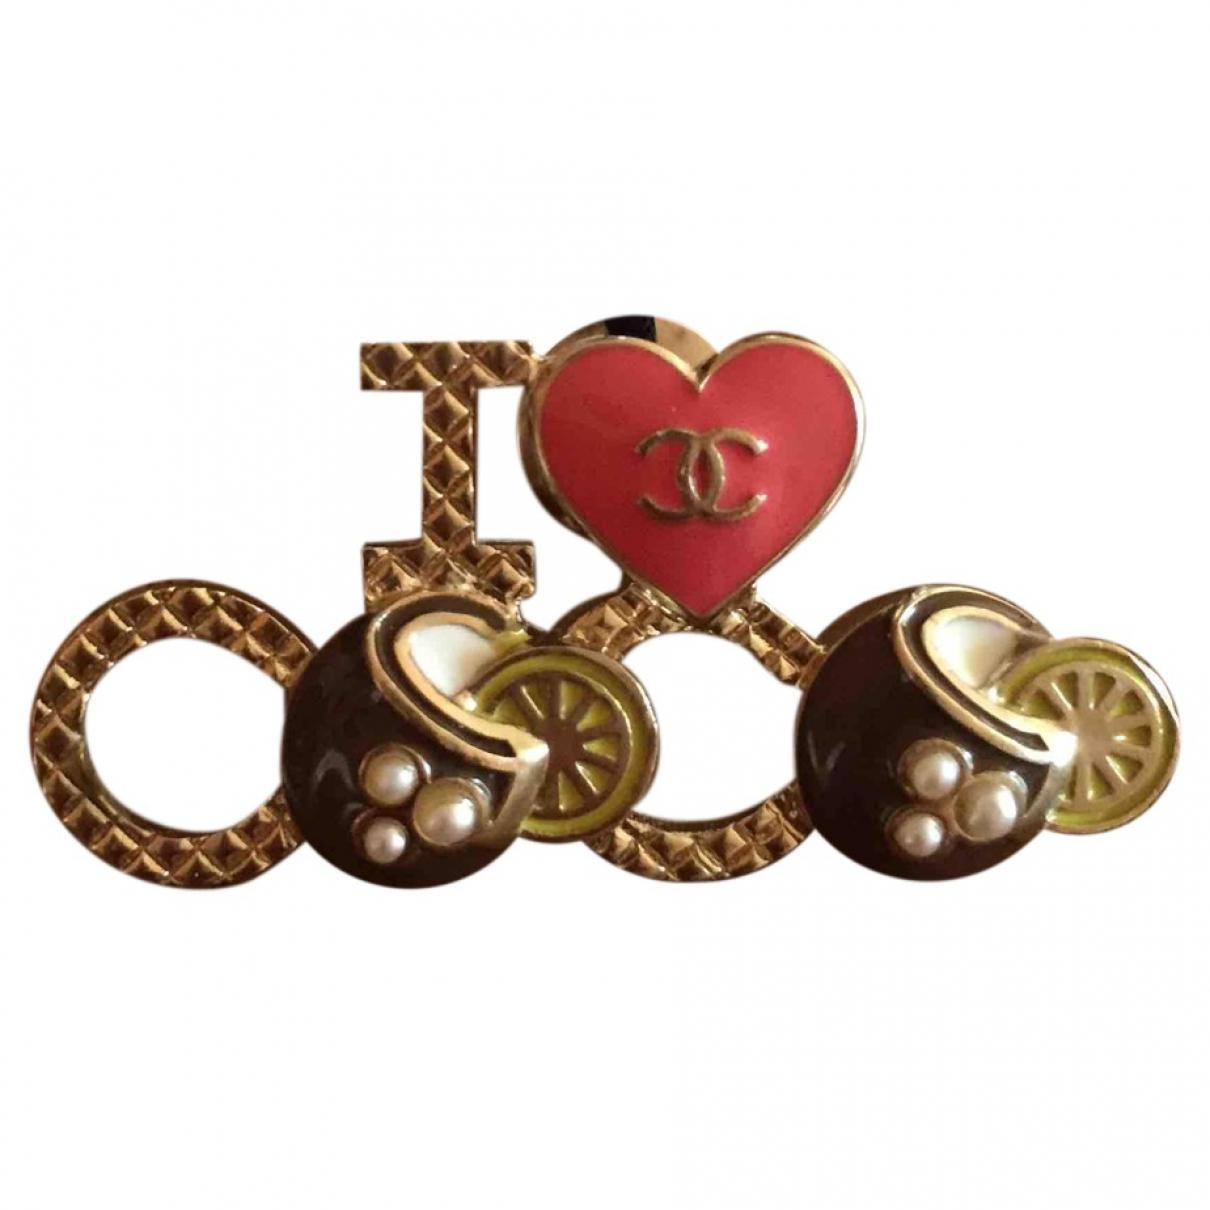 Chanel CC Brosche in  Bunt Metall